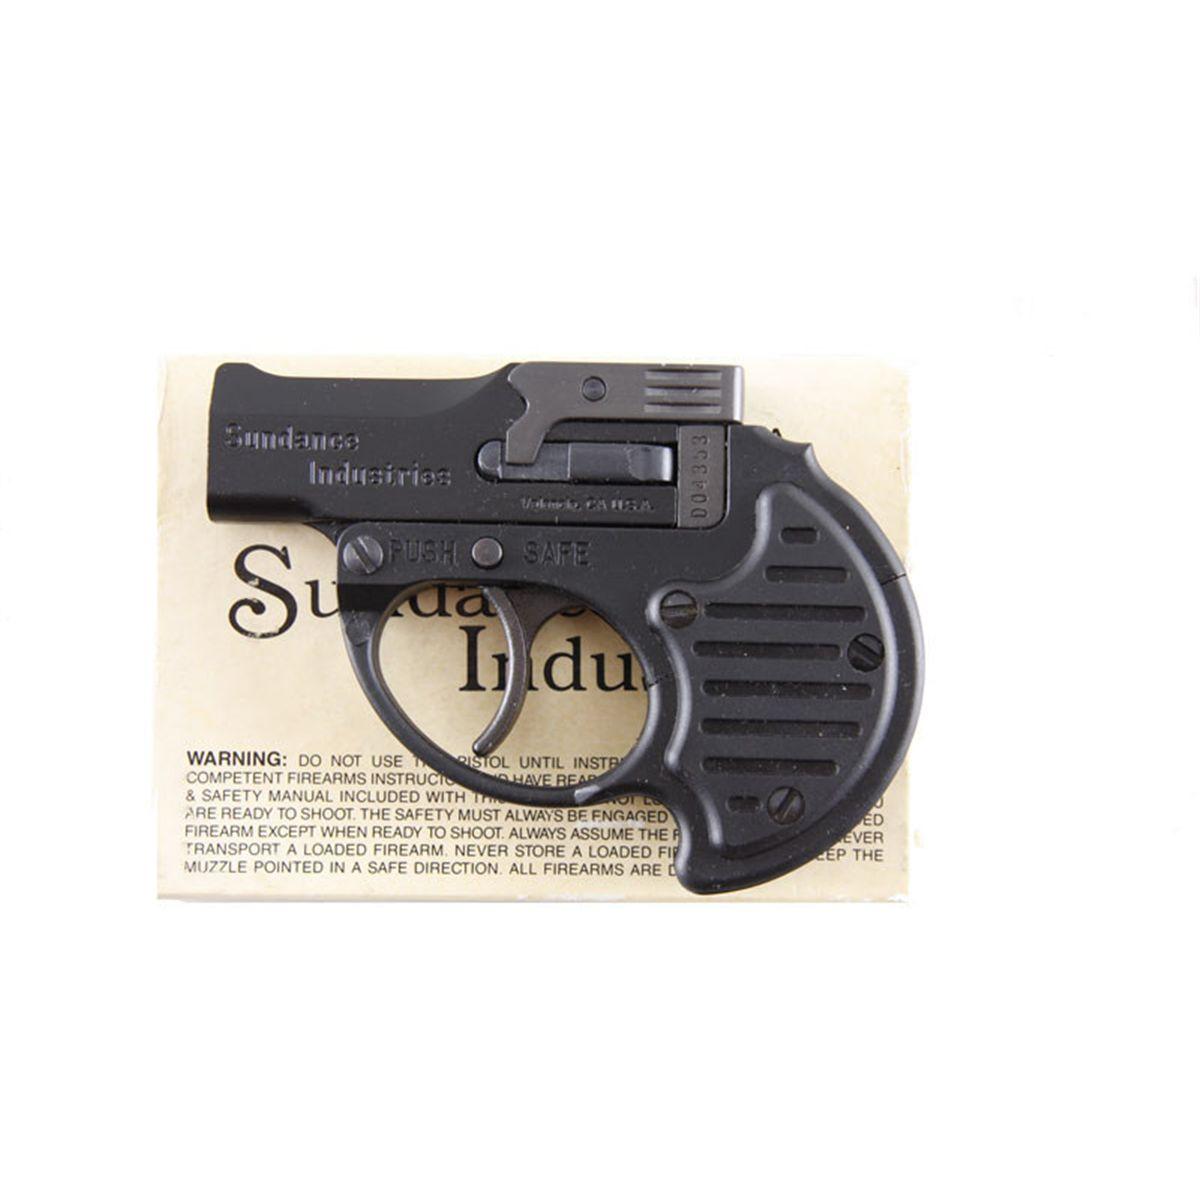 Sundance Ind  Derringer Cal  22 SN:D04353 Double barrel